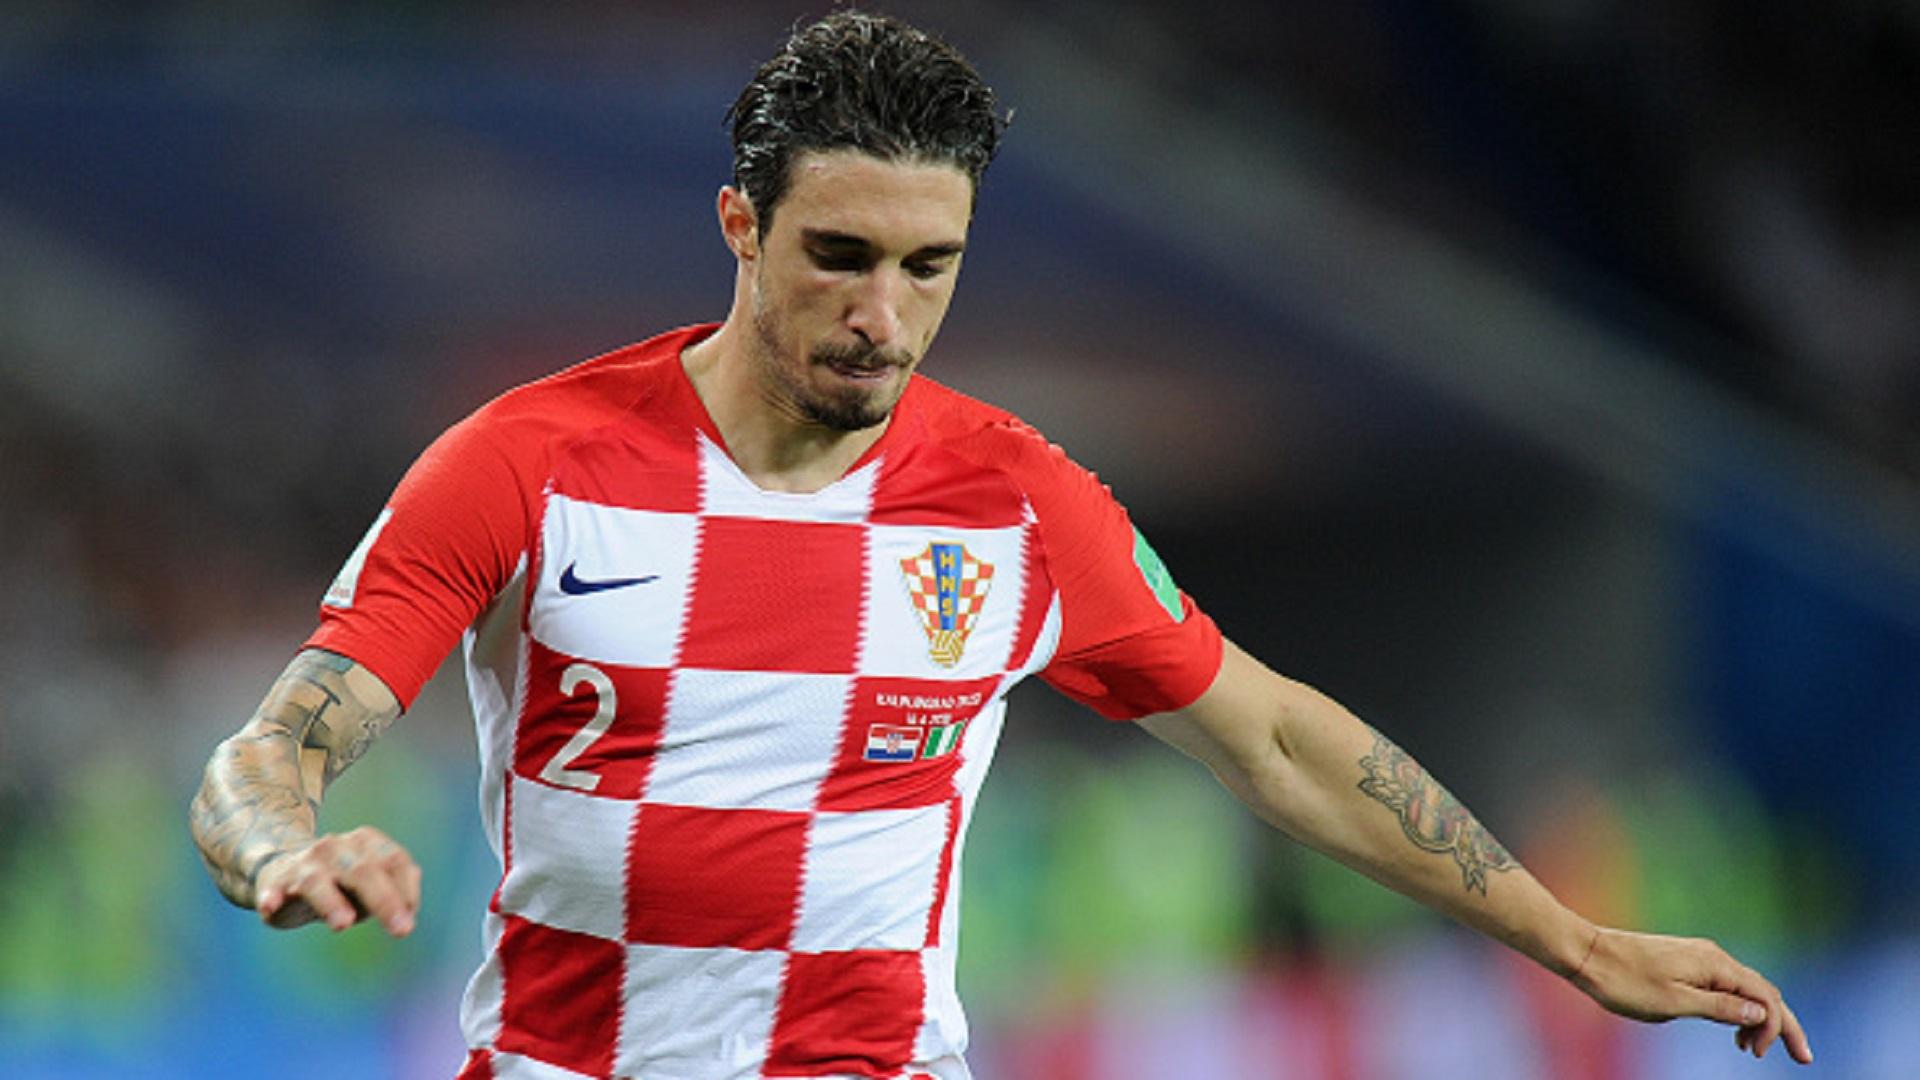 Sime Vrsaljko Croatia And Atletico Madrids Marauding Right Back Goal Com